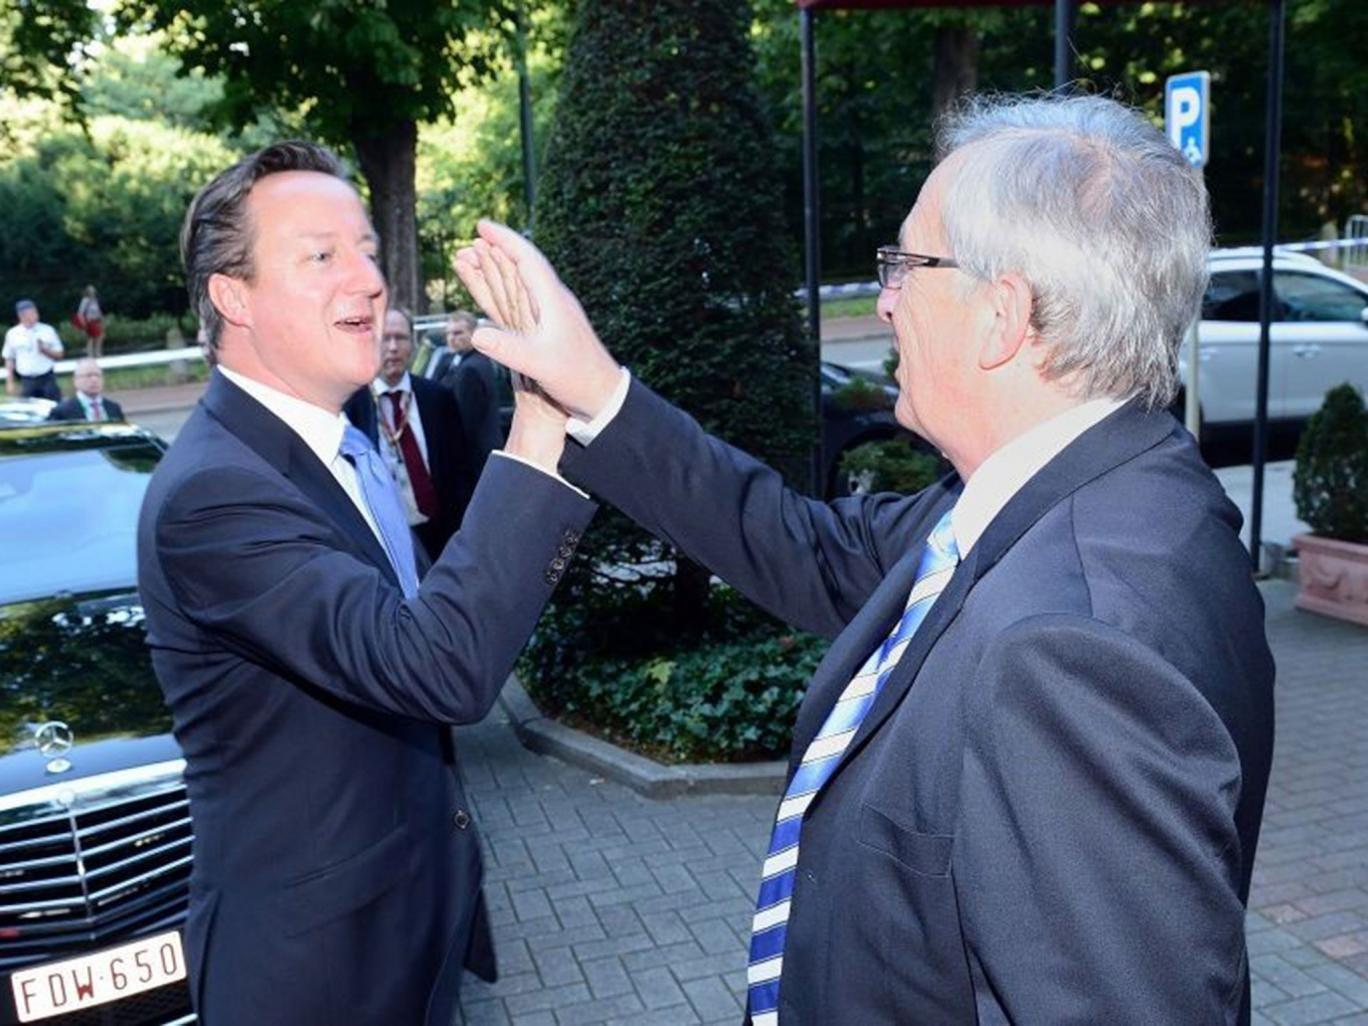 Jean-Claude Juncker high-fives David Cameron at the European Parliament in Brussels, Belgium.